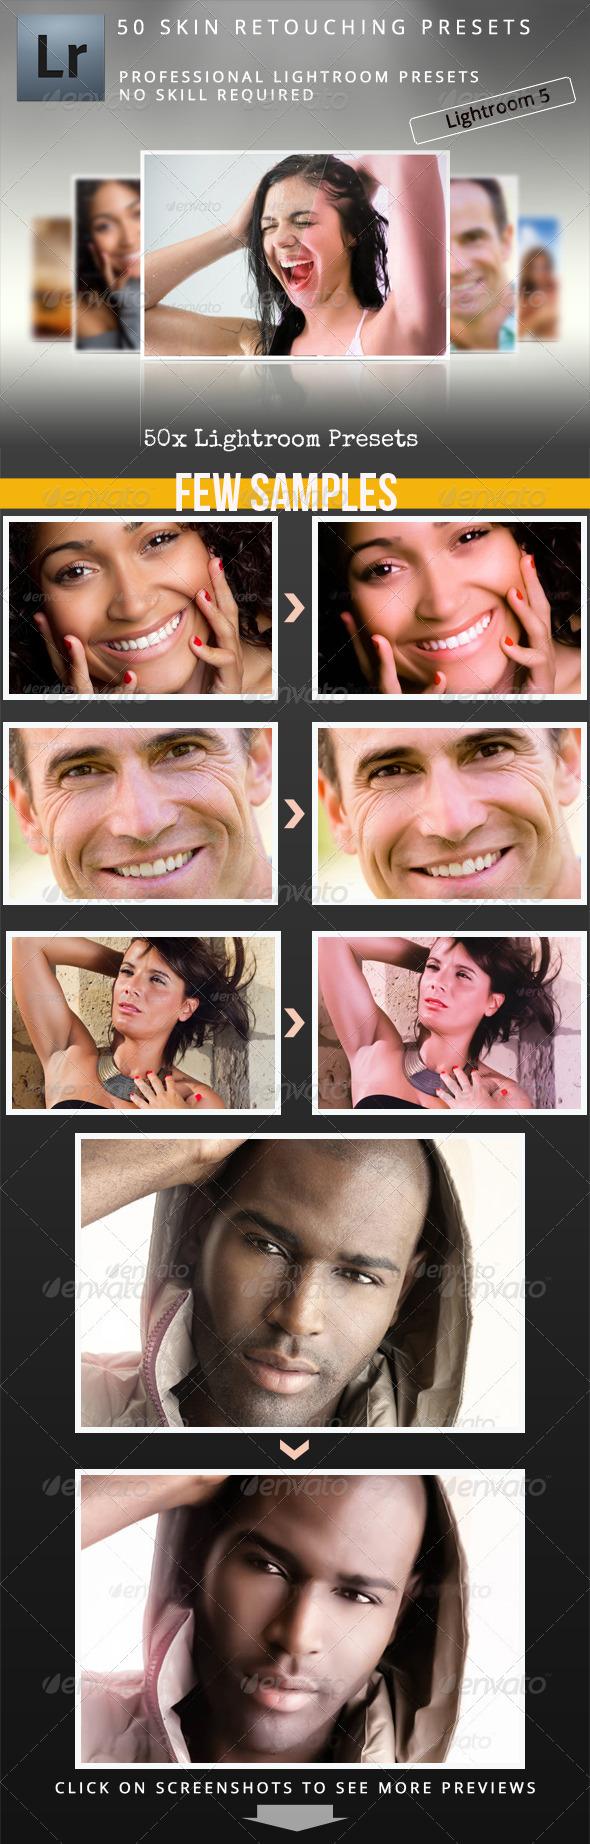 50 Skin Retouching Presets - Lightroom Presets Add-ons